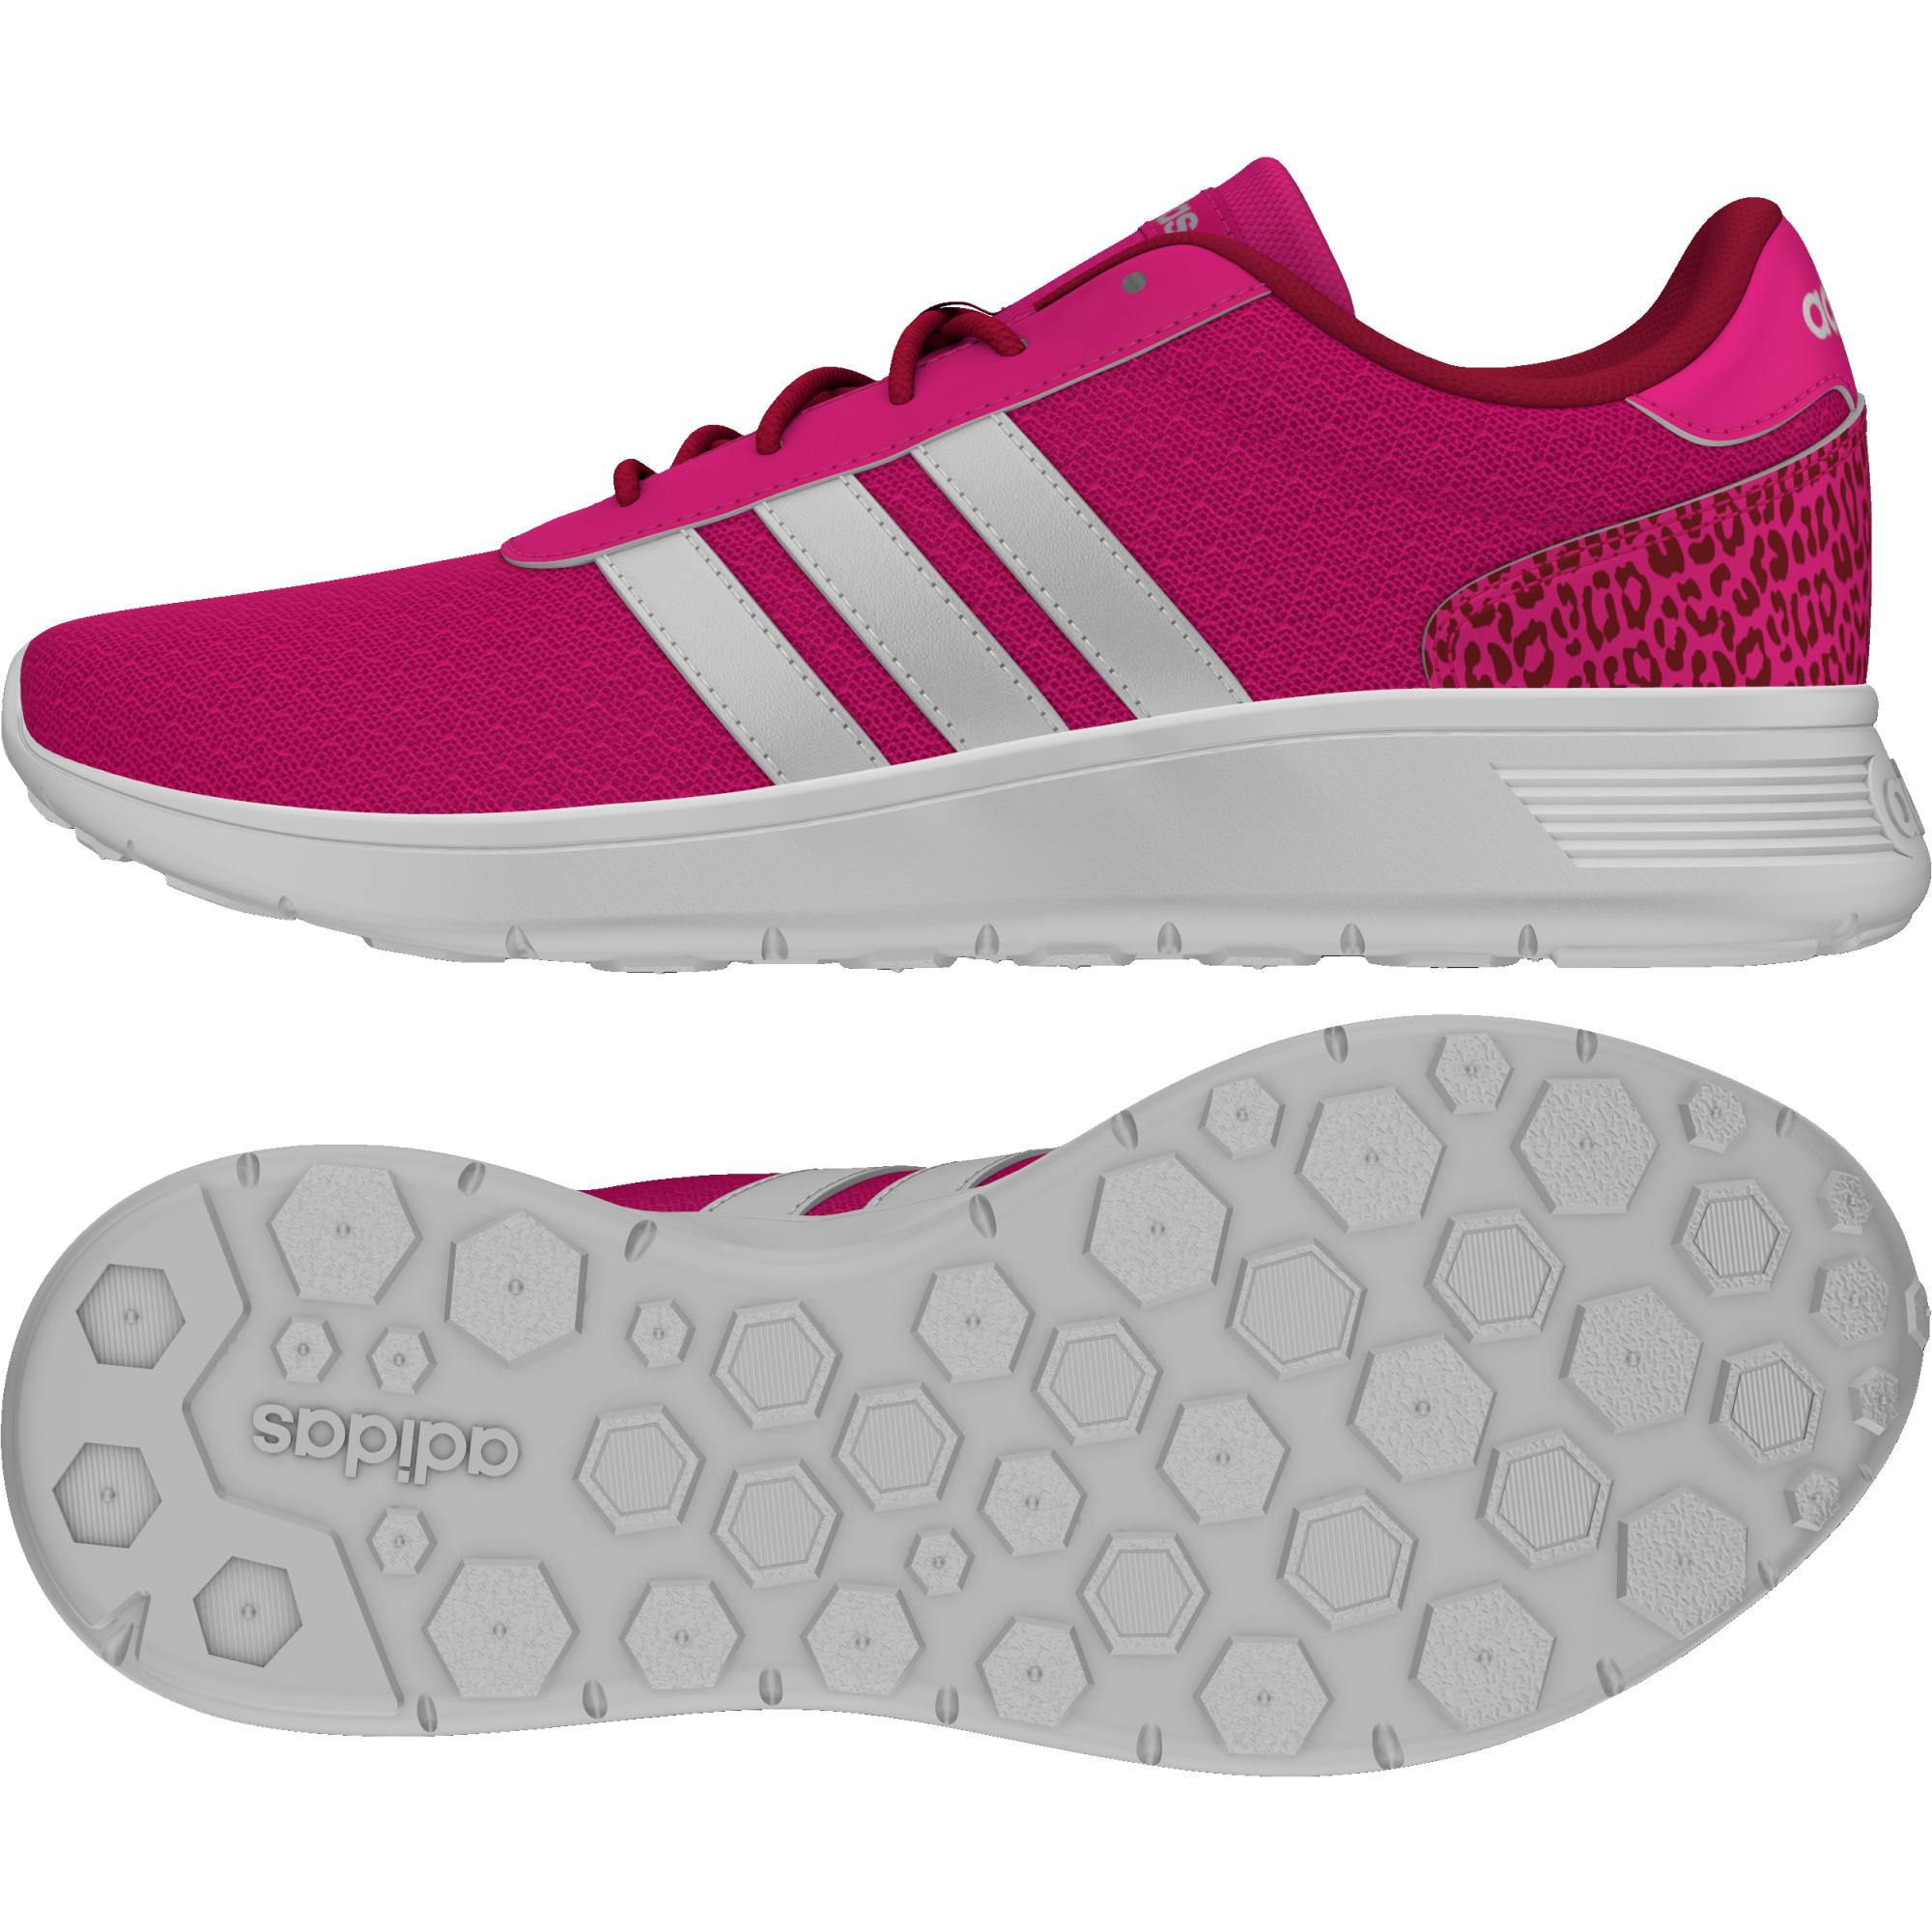 7f1f6c96e8 Adidas Lite Racer női utcai cipő , Női cipő | utcai cipő , adidas_neo ,  Adidas Lite Racer női utcai cipő